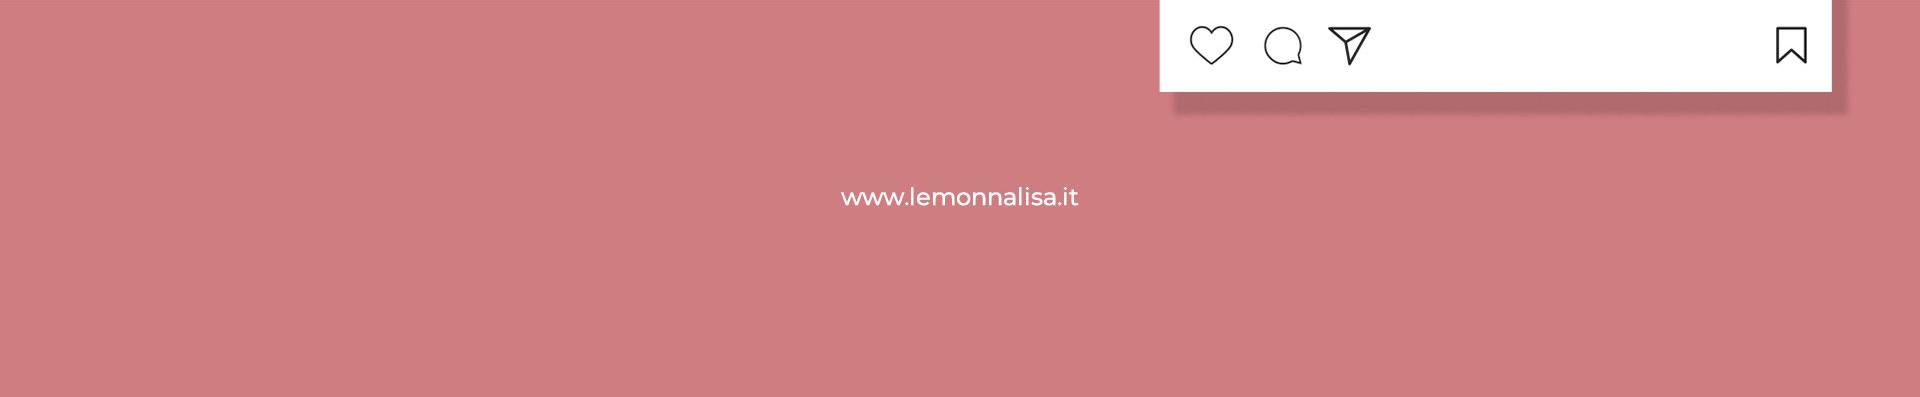 le-monnalisa-instagram-link